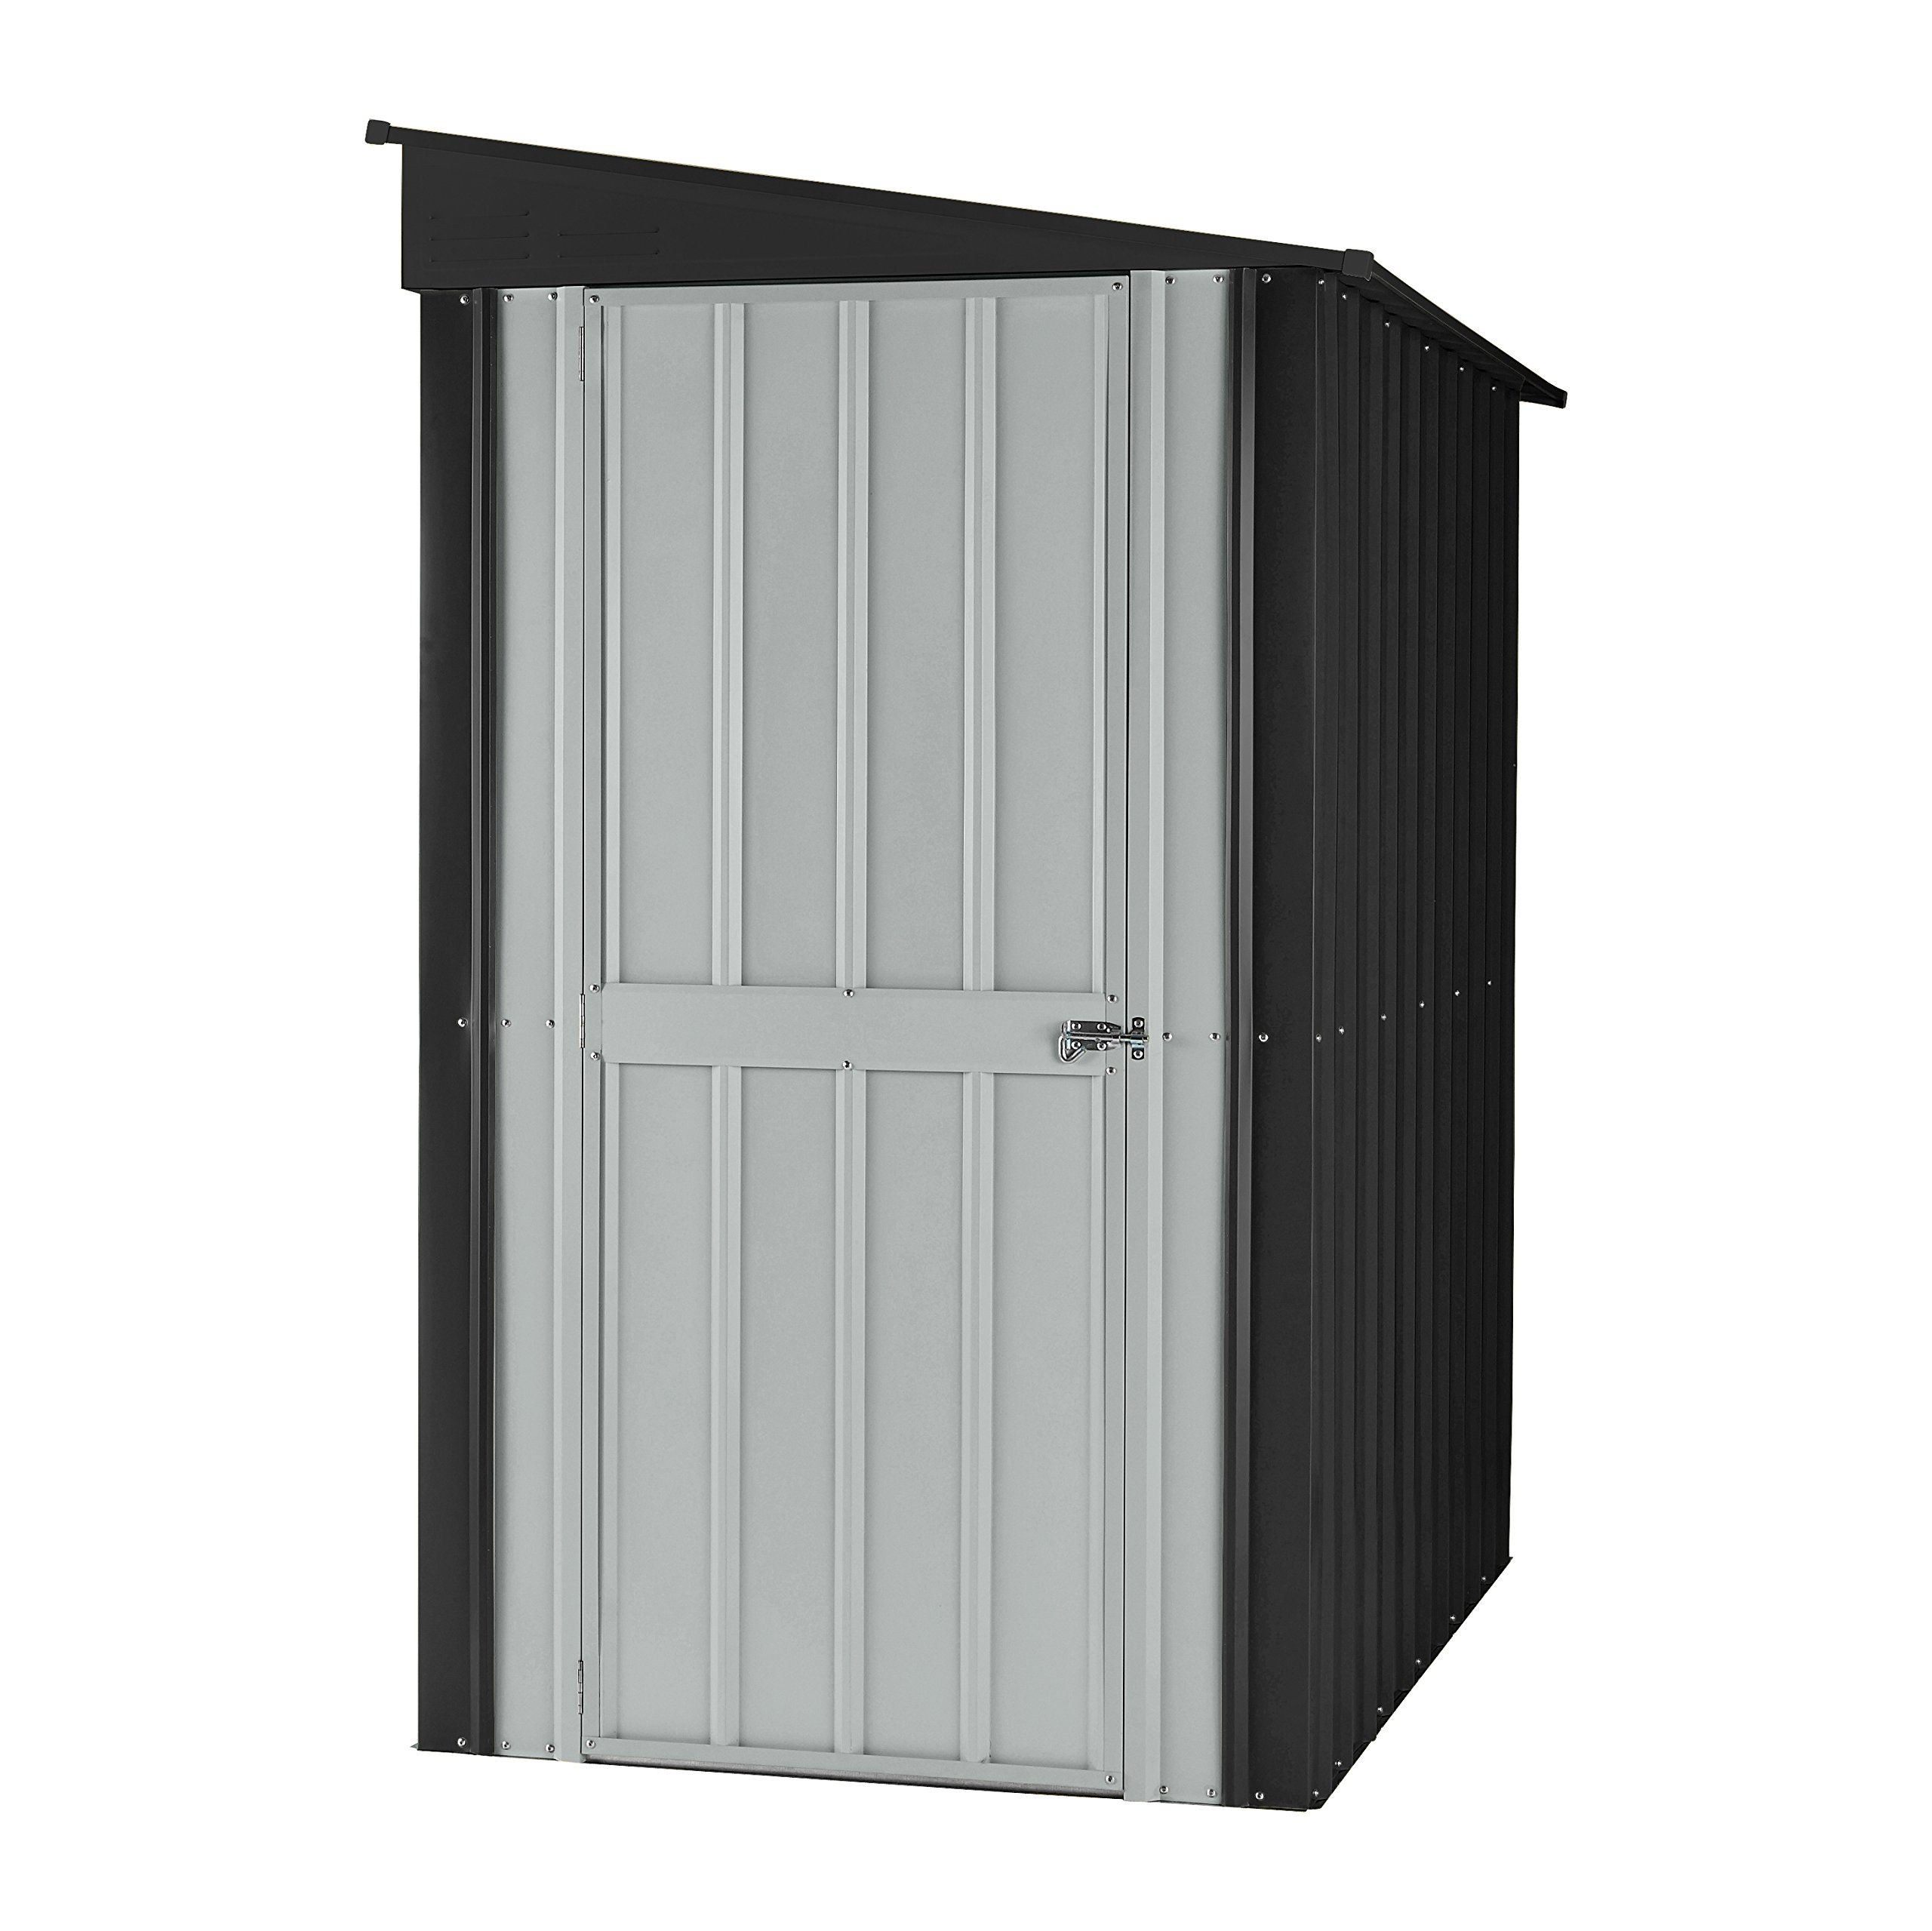 Globel 4x6 Lean-To Steel Storage Shed Slate Grey and Aluminum White by Globel (Image #2)